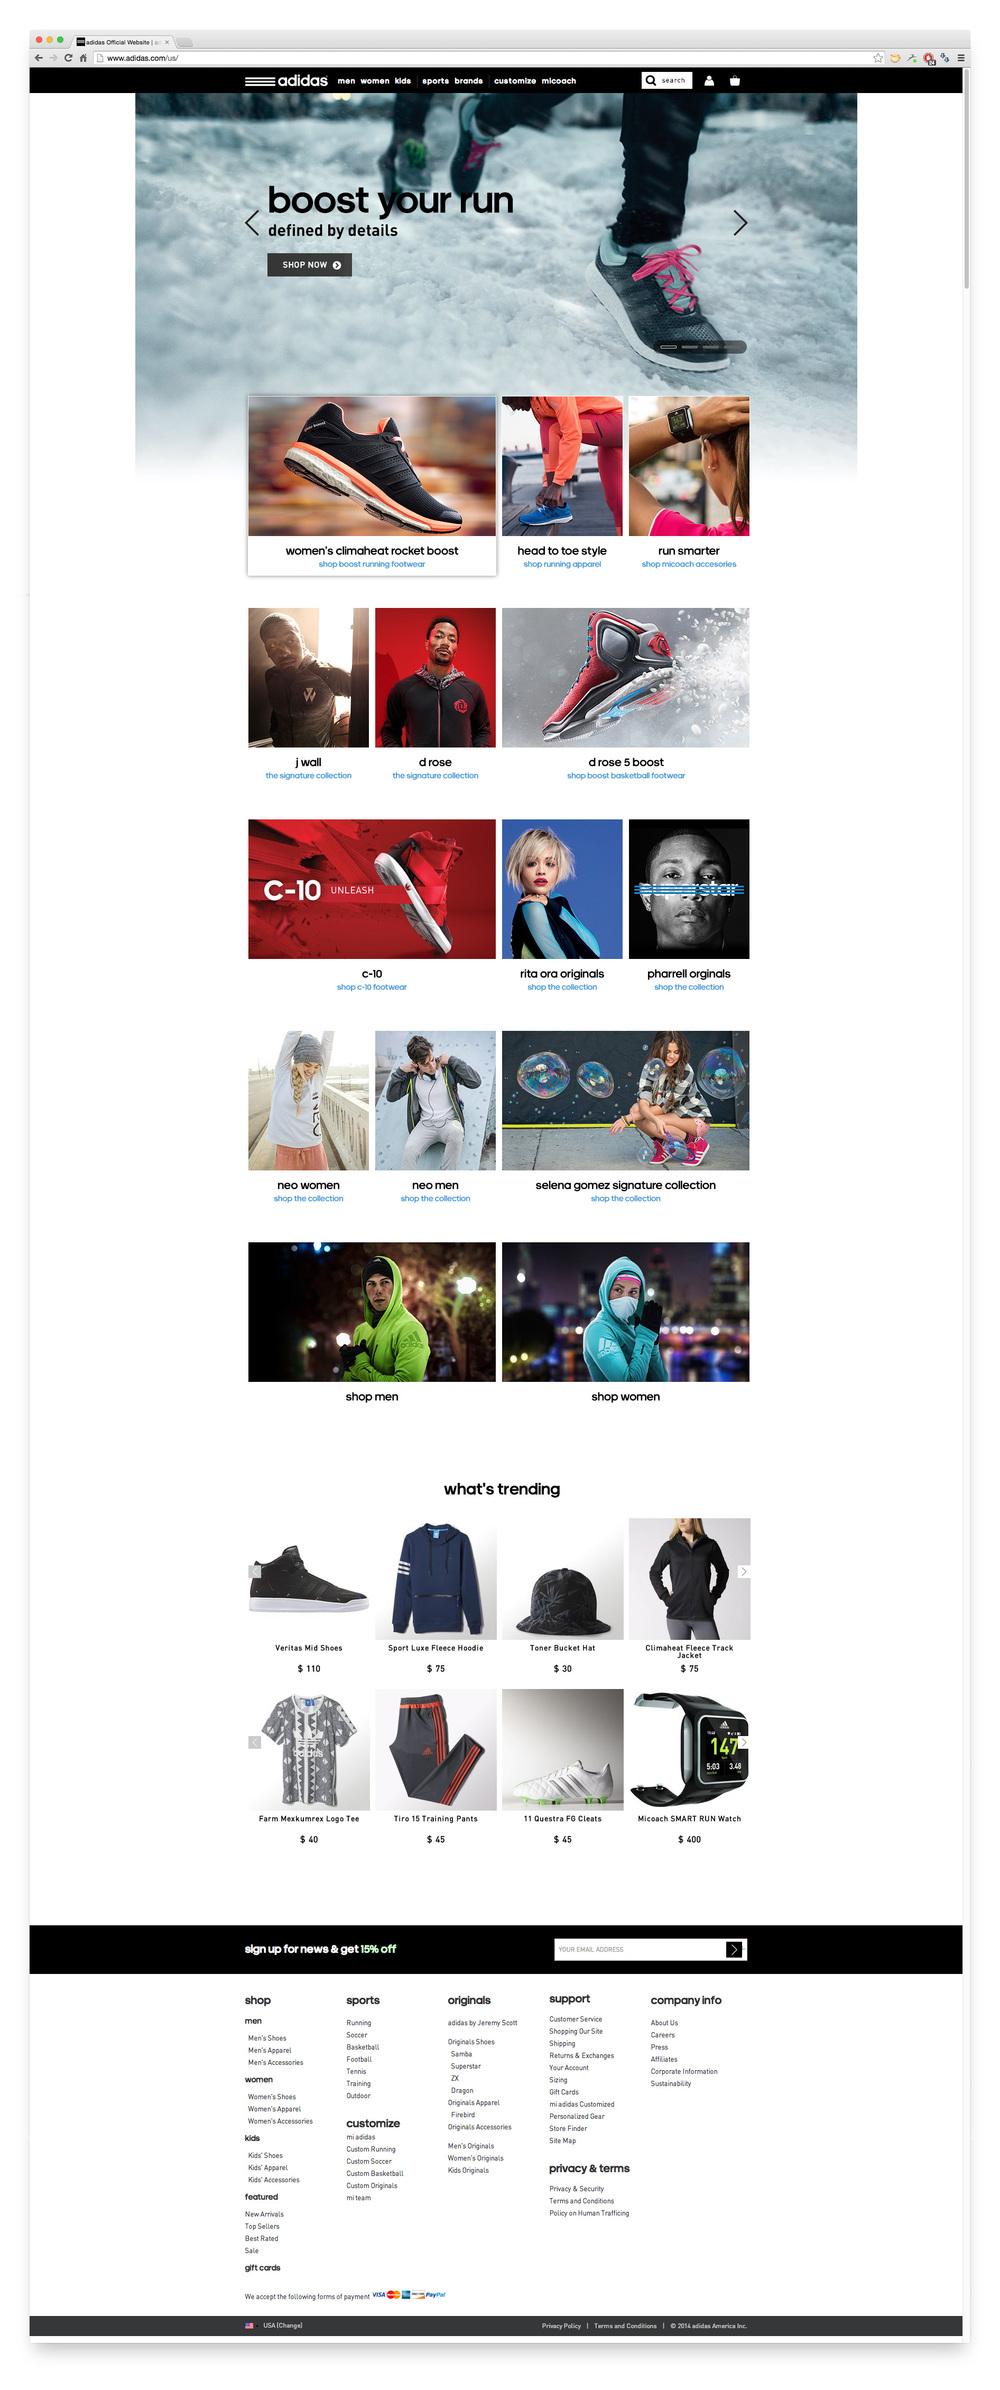 Adidas Campaign Concept